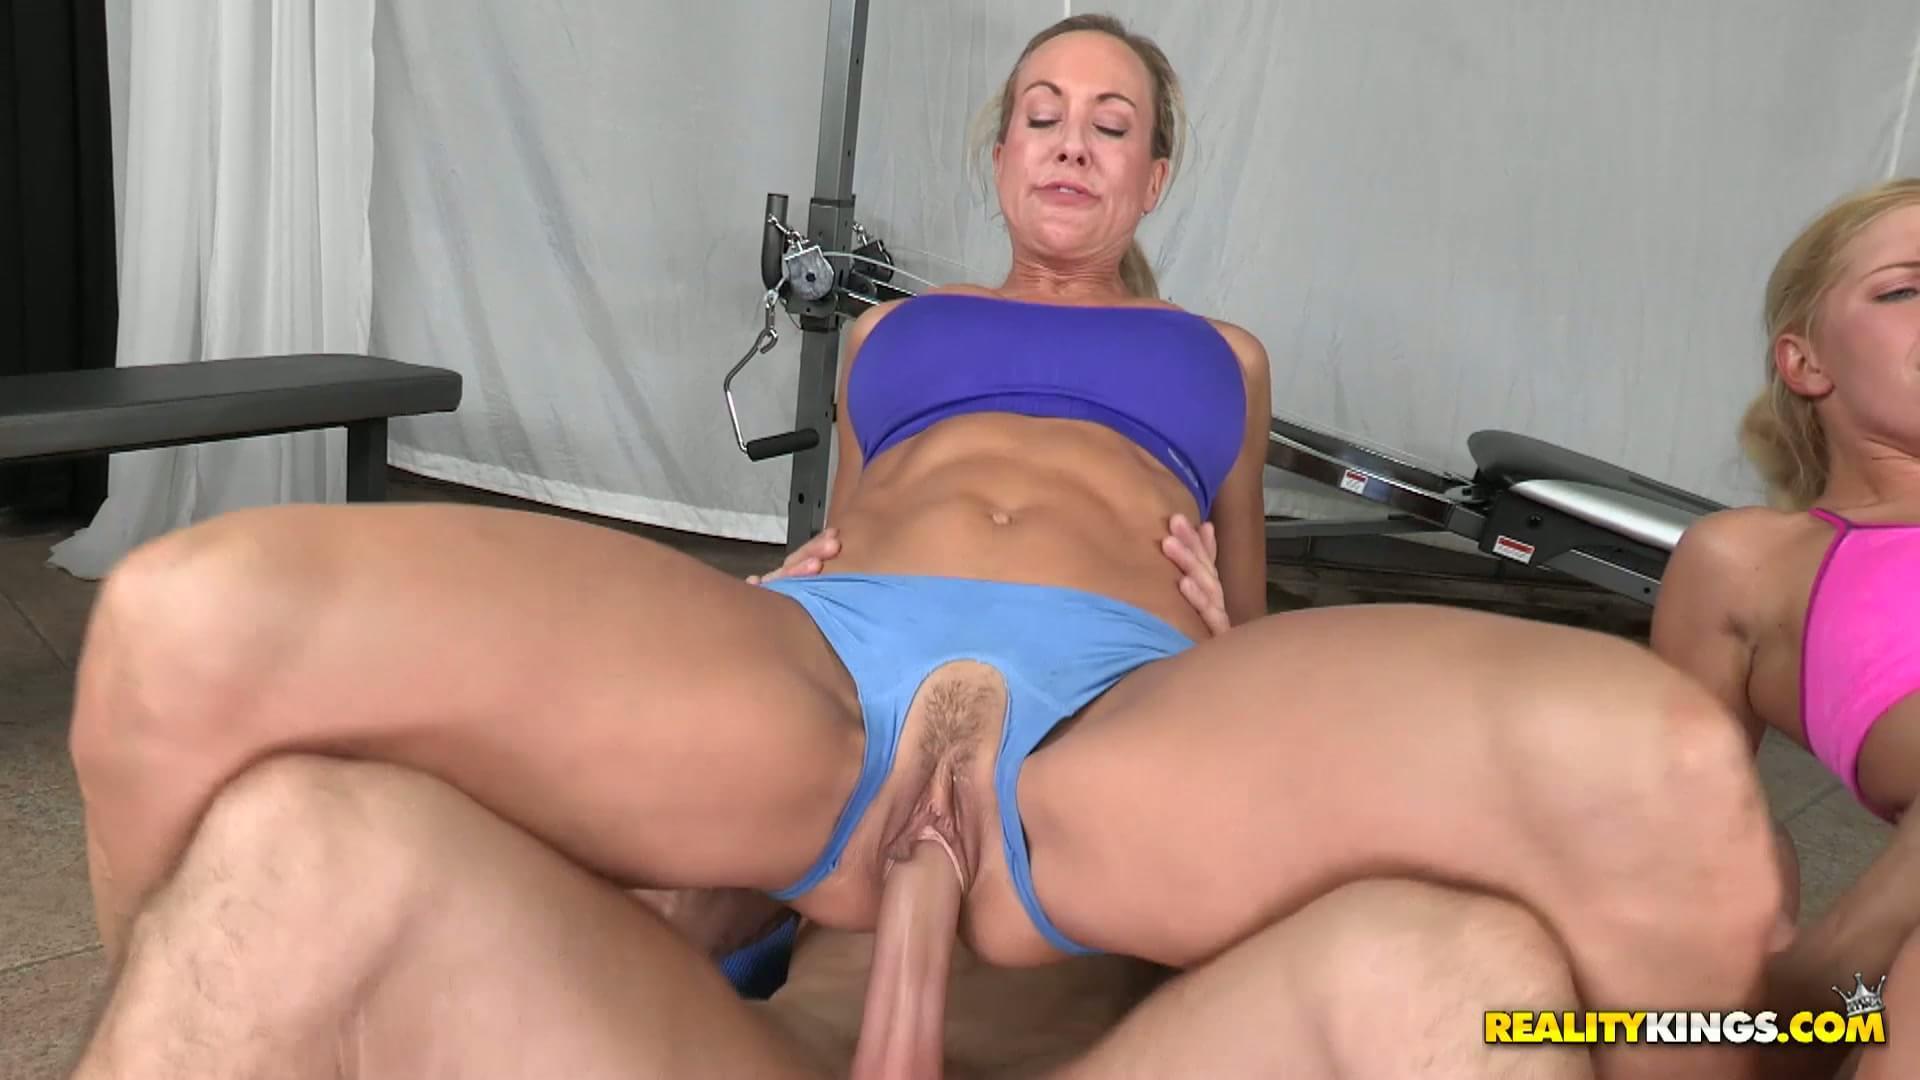 brandi love gym porn № 22140